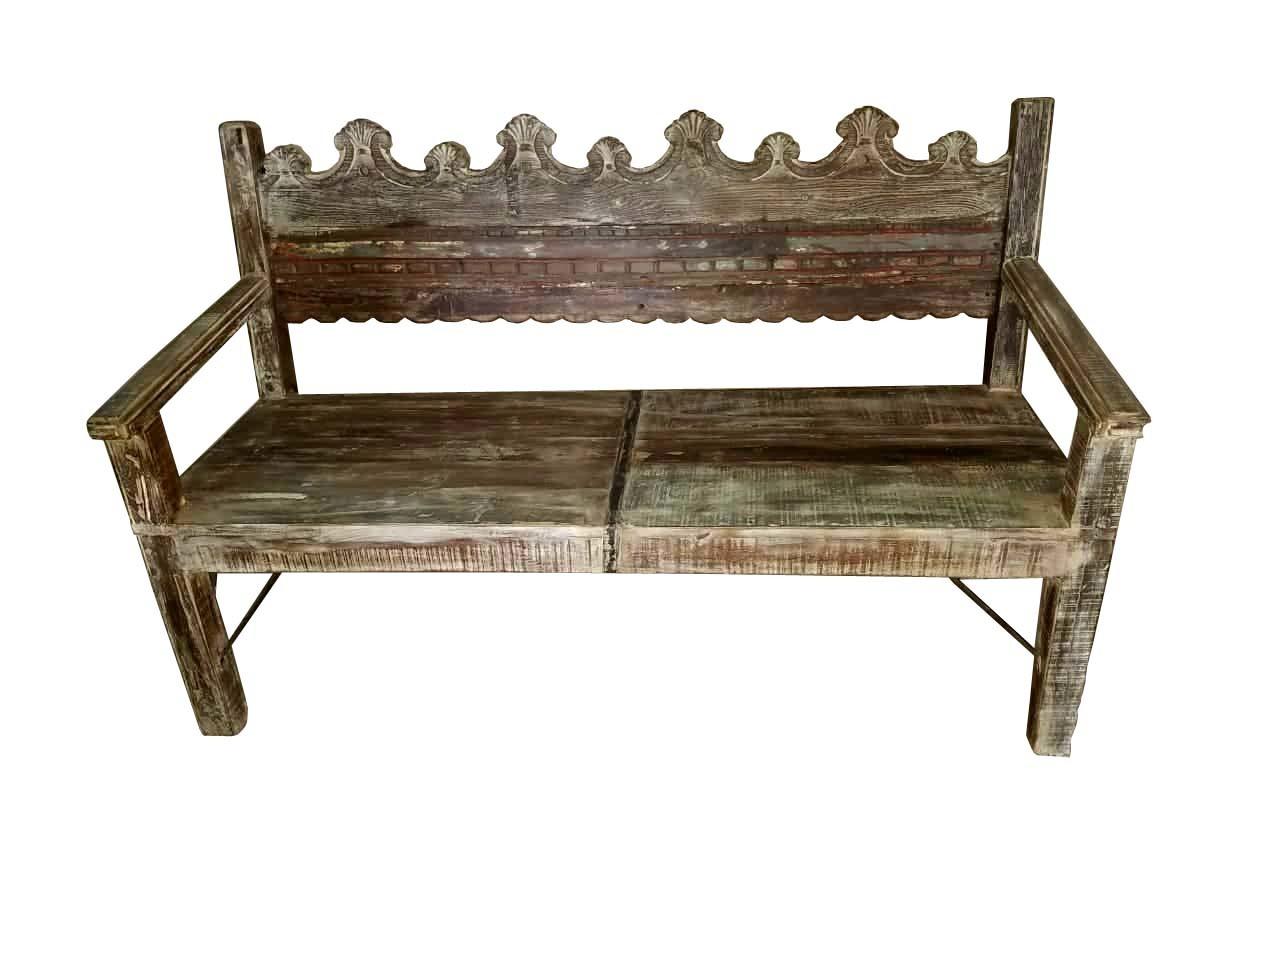 Antique benches